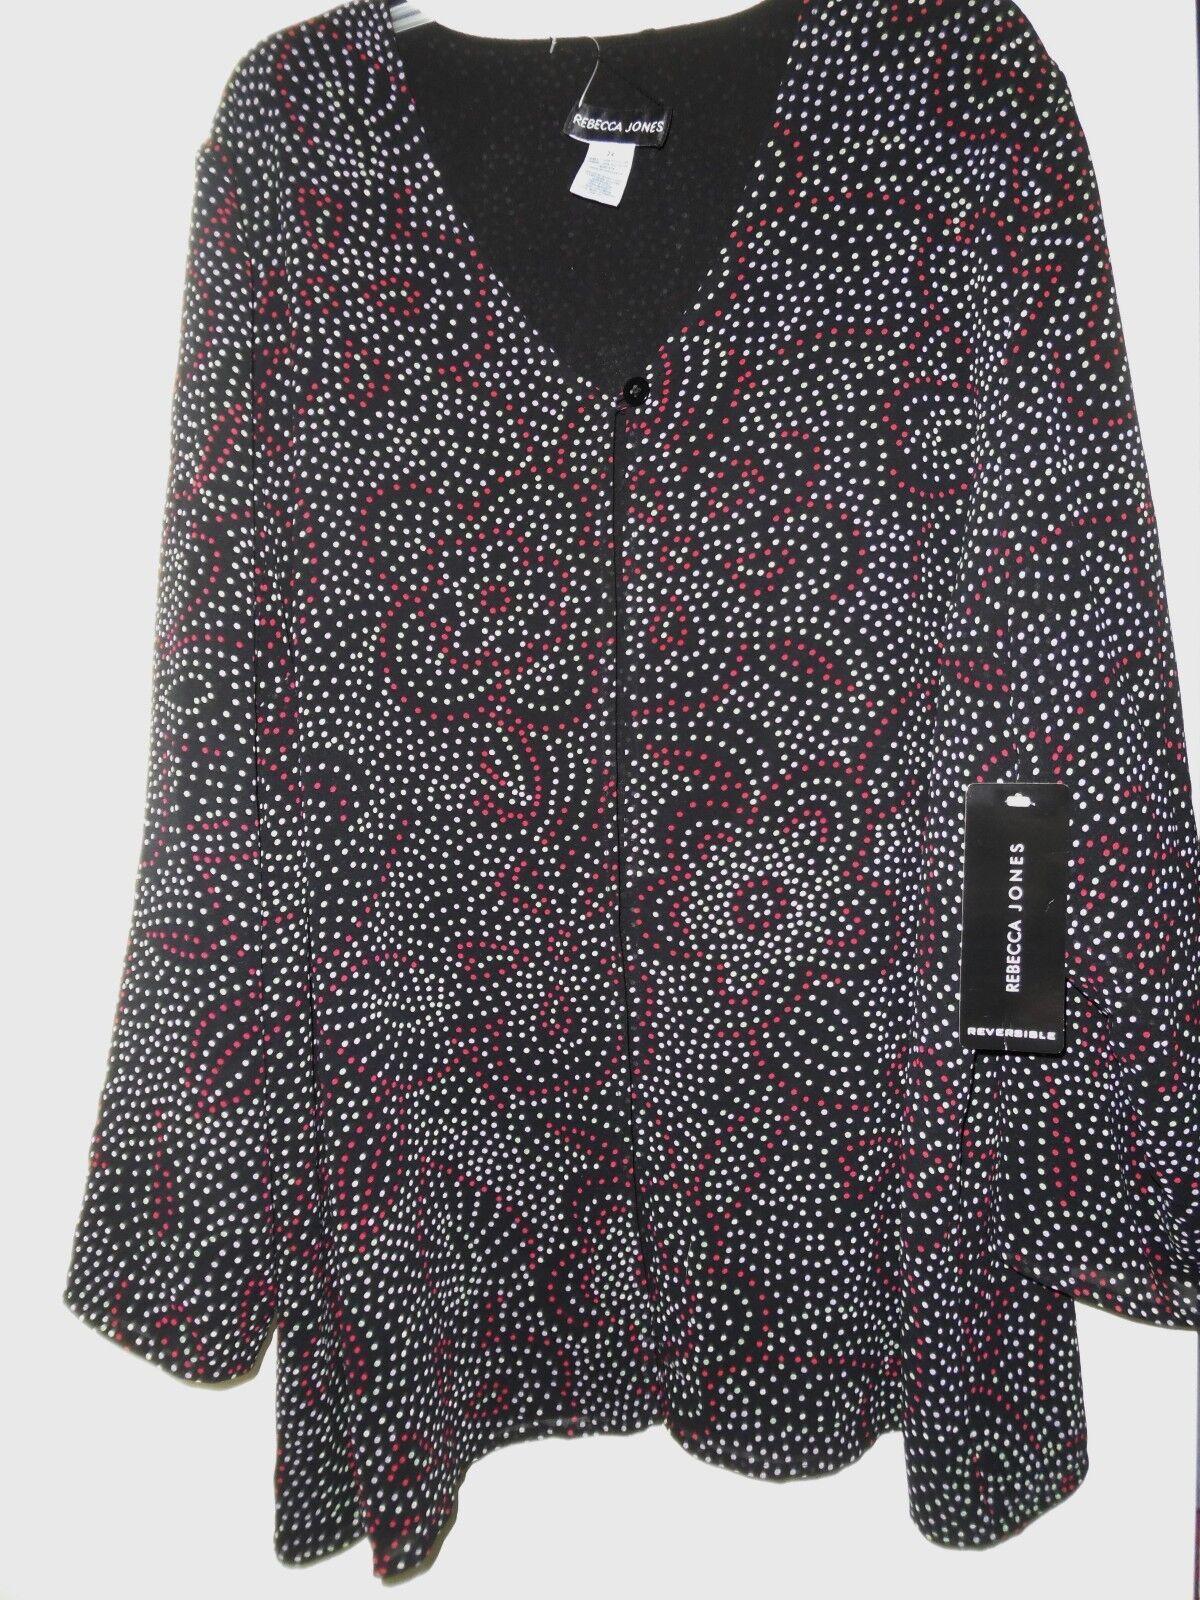 plus sz 24w coverlet jacket reversible mosaic